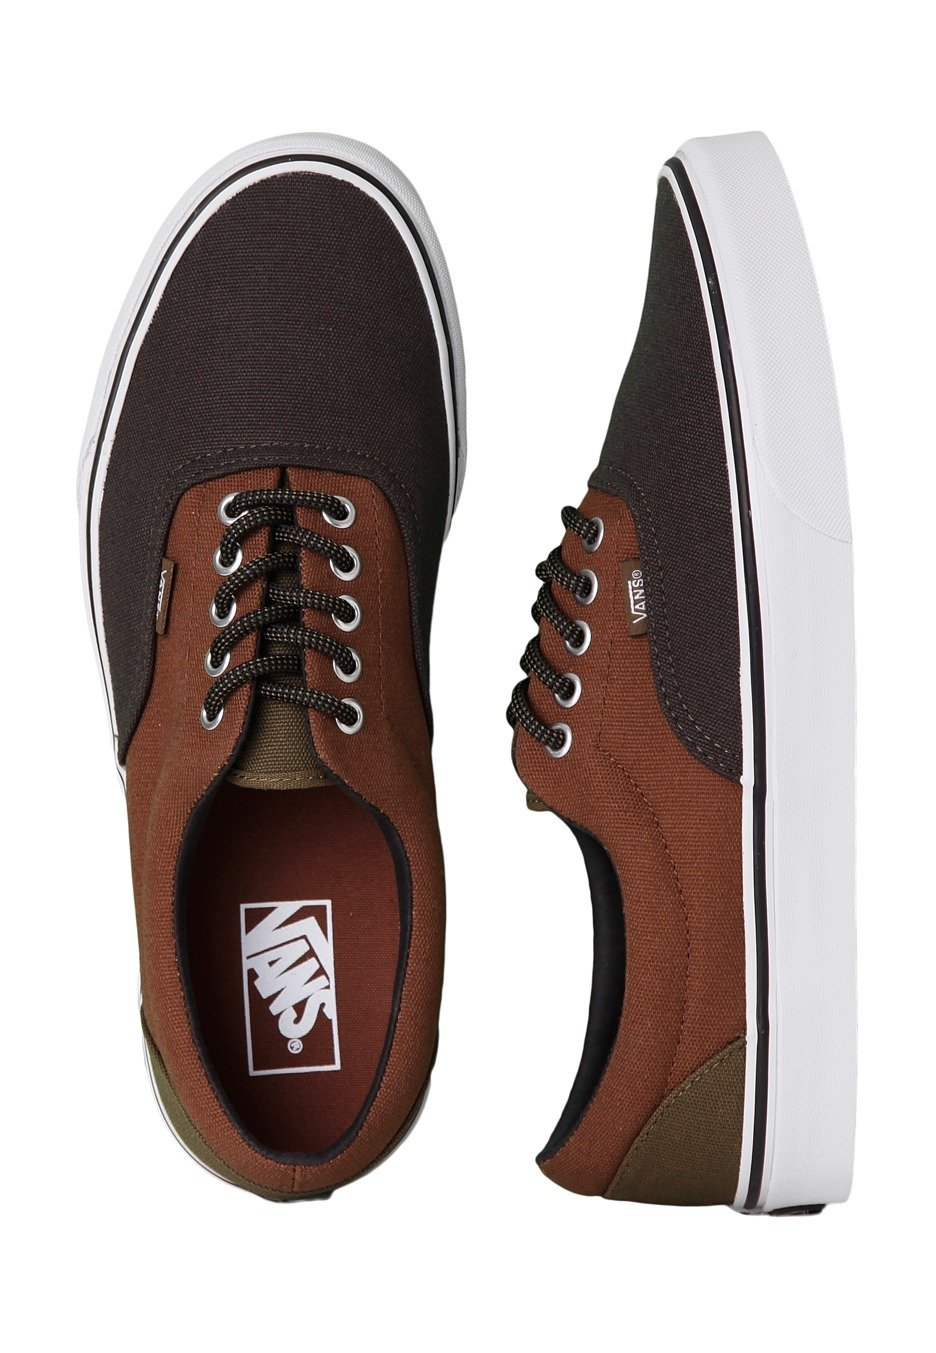 Vans - Era Black Olive Monk´s Robe - Shoes - Impericon.com UK 3e748b8a56